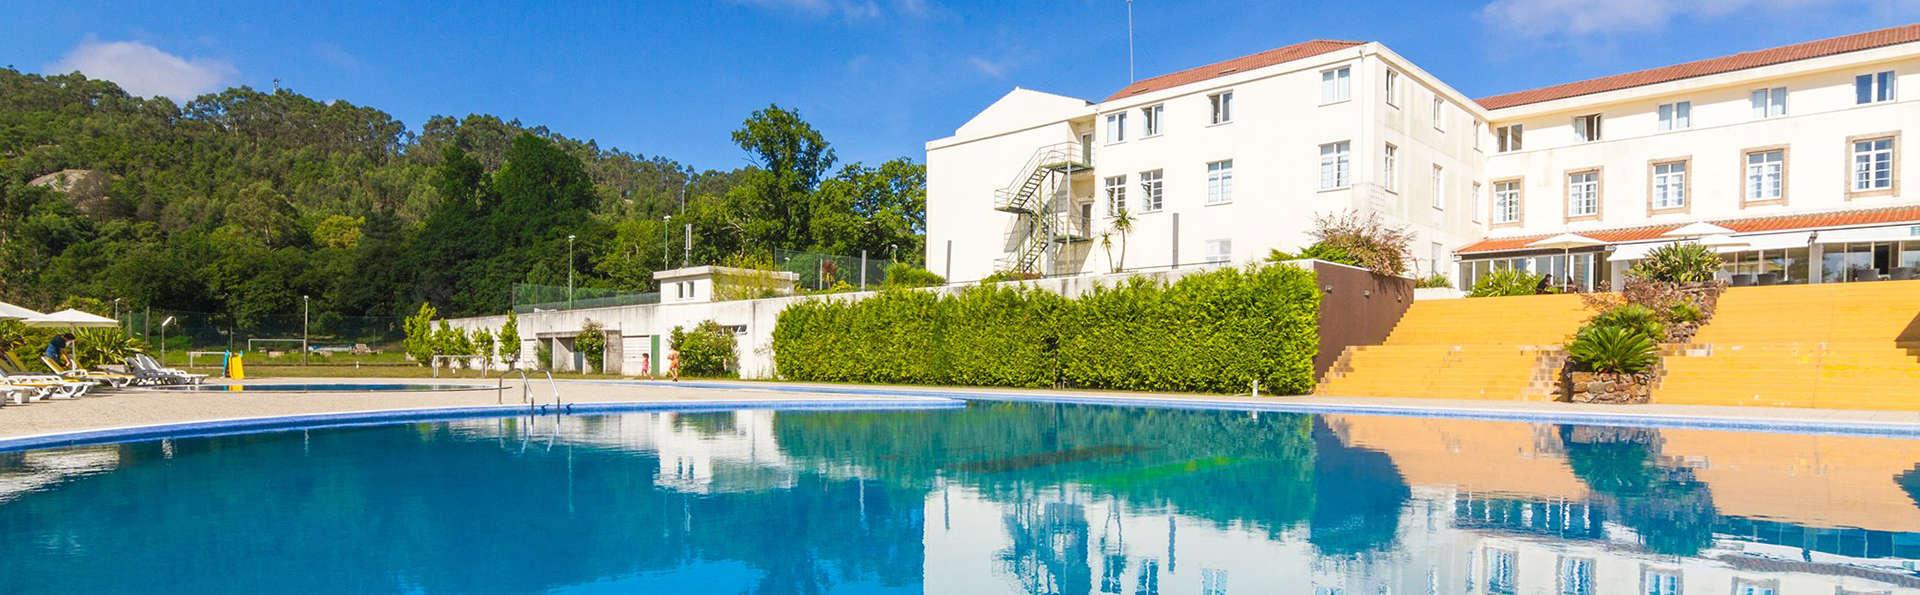 Golden Tulip Braga Hotel & Spa - EDIT_pool2.jpg